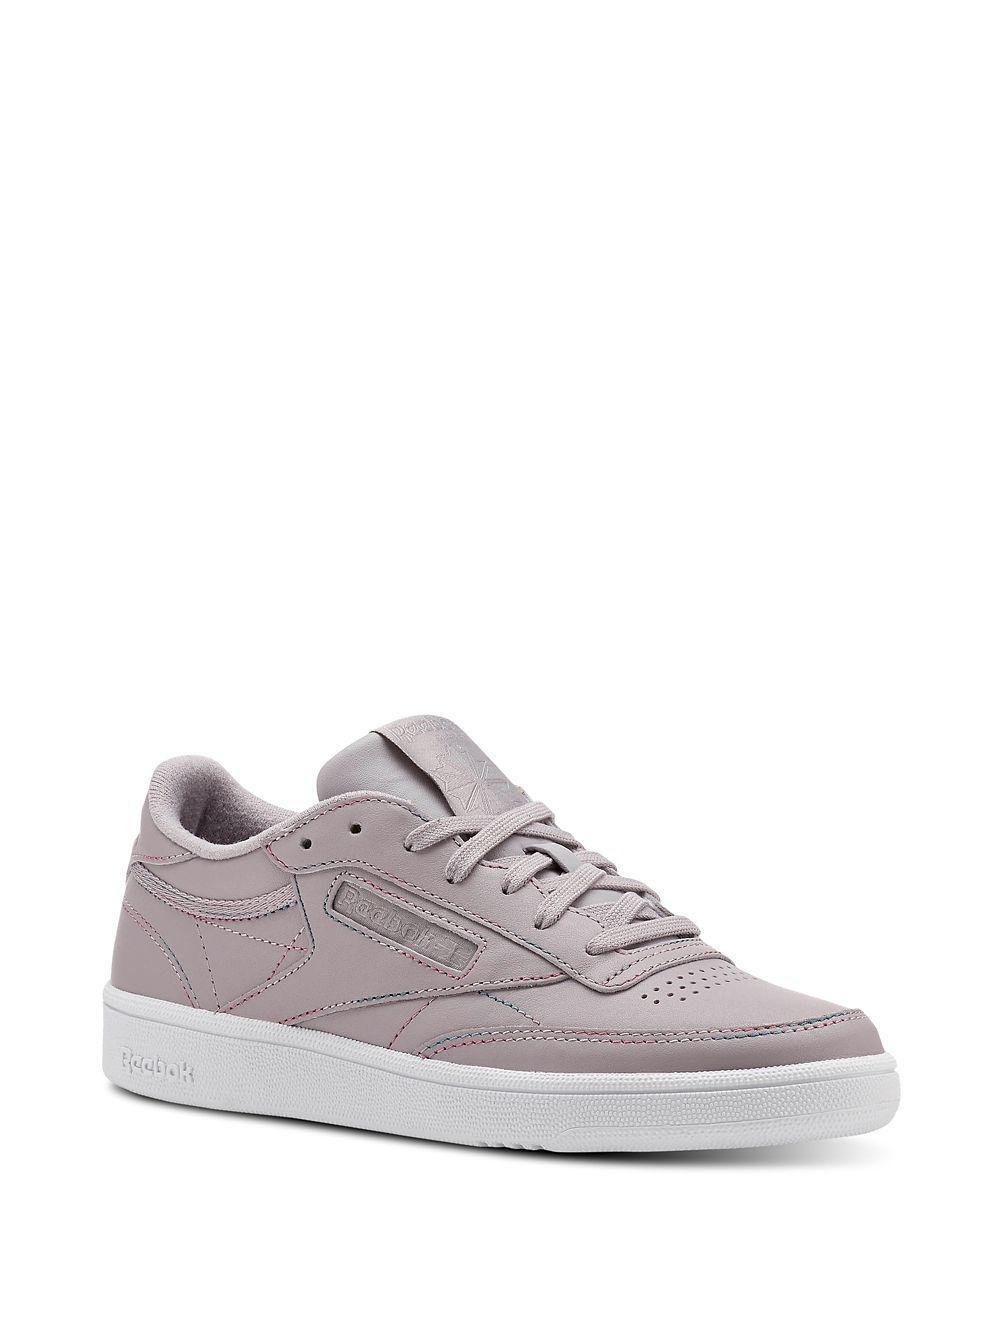 9f7548201fb22 Reebok Club C 85 Leather Low-top Sneakers in Gray - Lyst